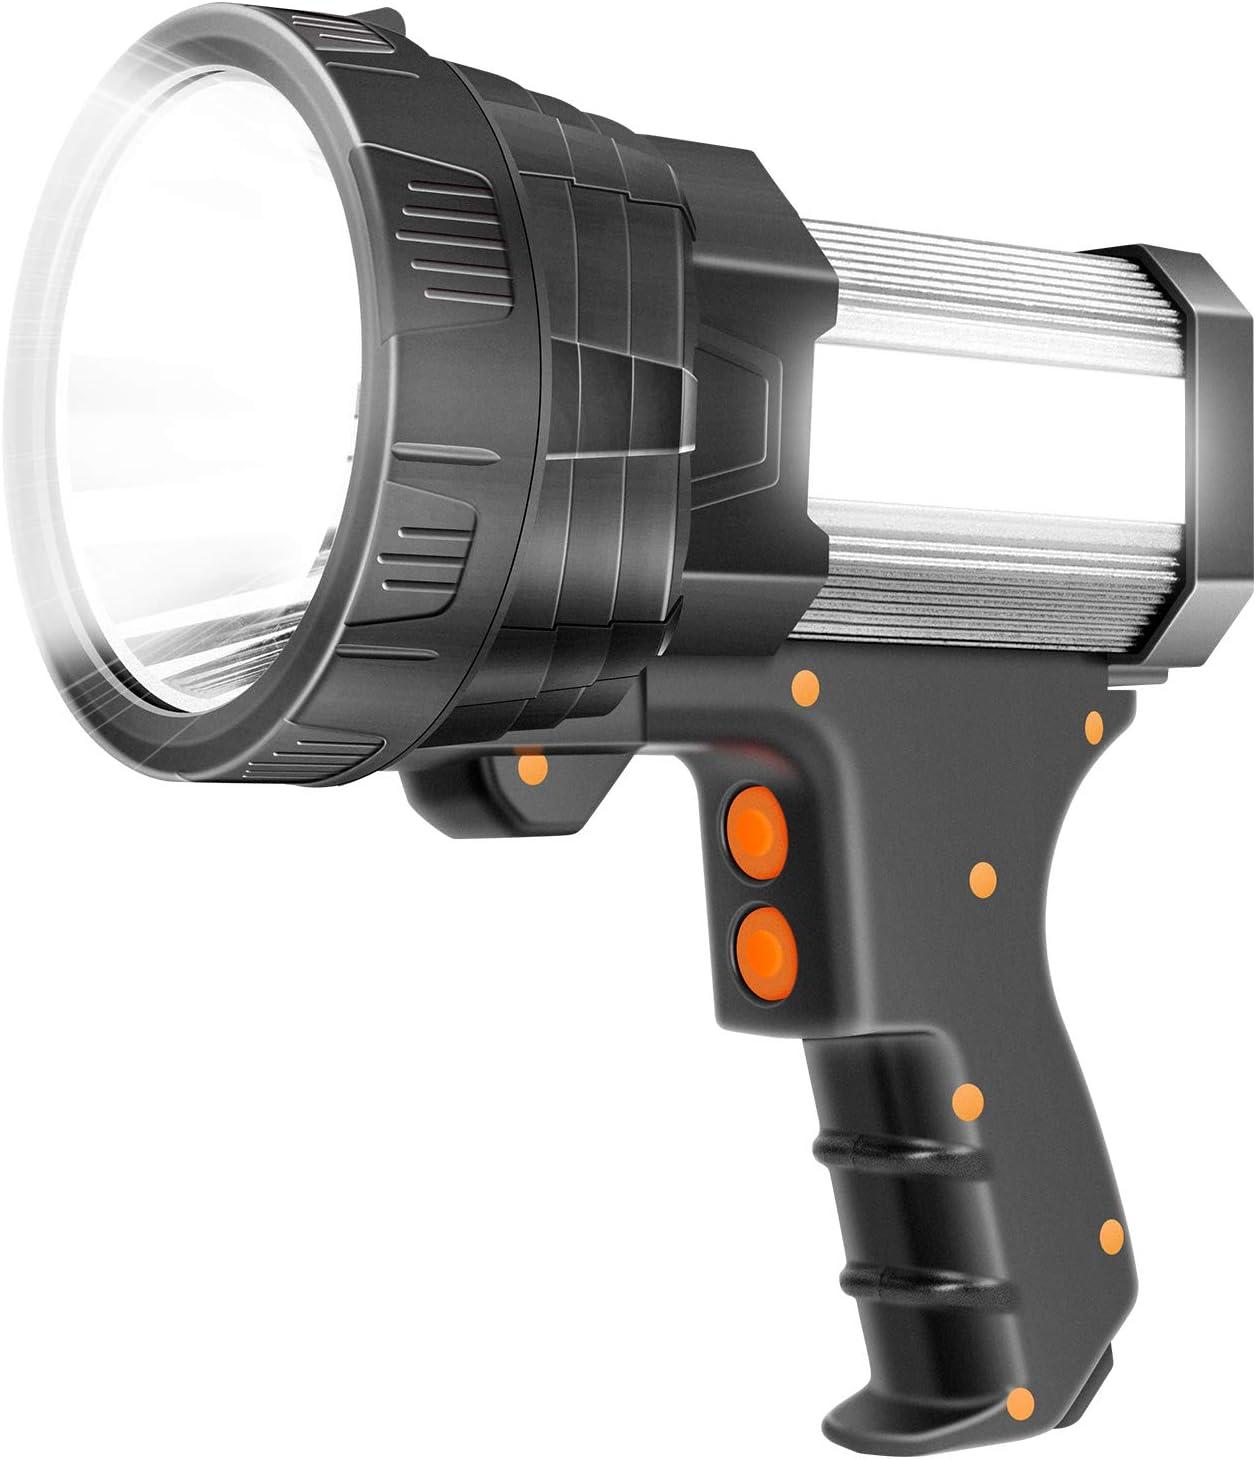 Super Bright Spotlight 6000 Lumen LED Flashlight Handheld Rechargeable Spot light 9600mAh Long Lasting Large Torchlight Searchlight and Floodlight Fishing Hiking Camping Flashlight USB Output